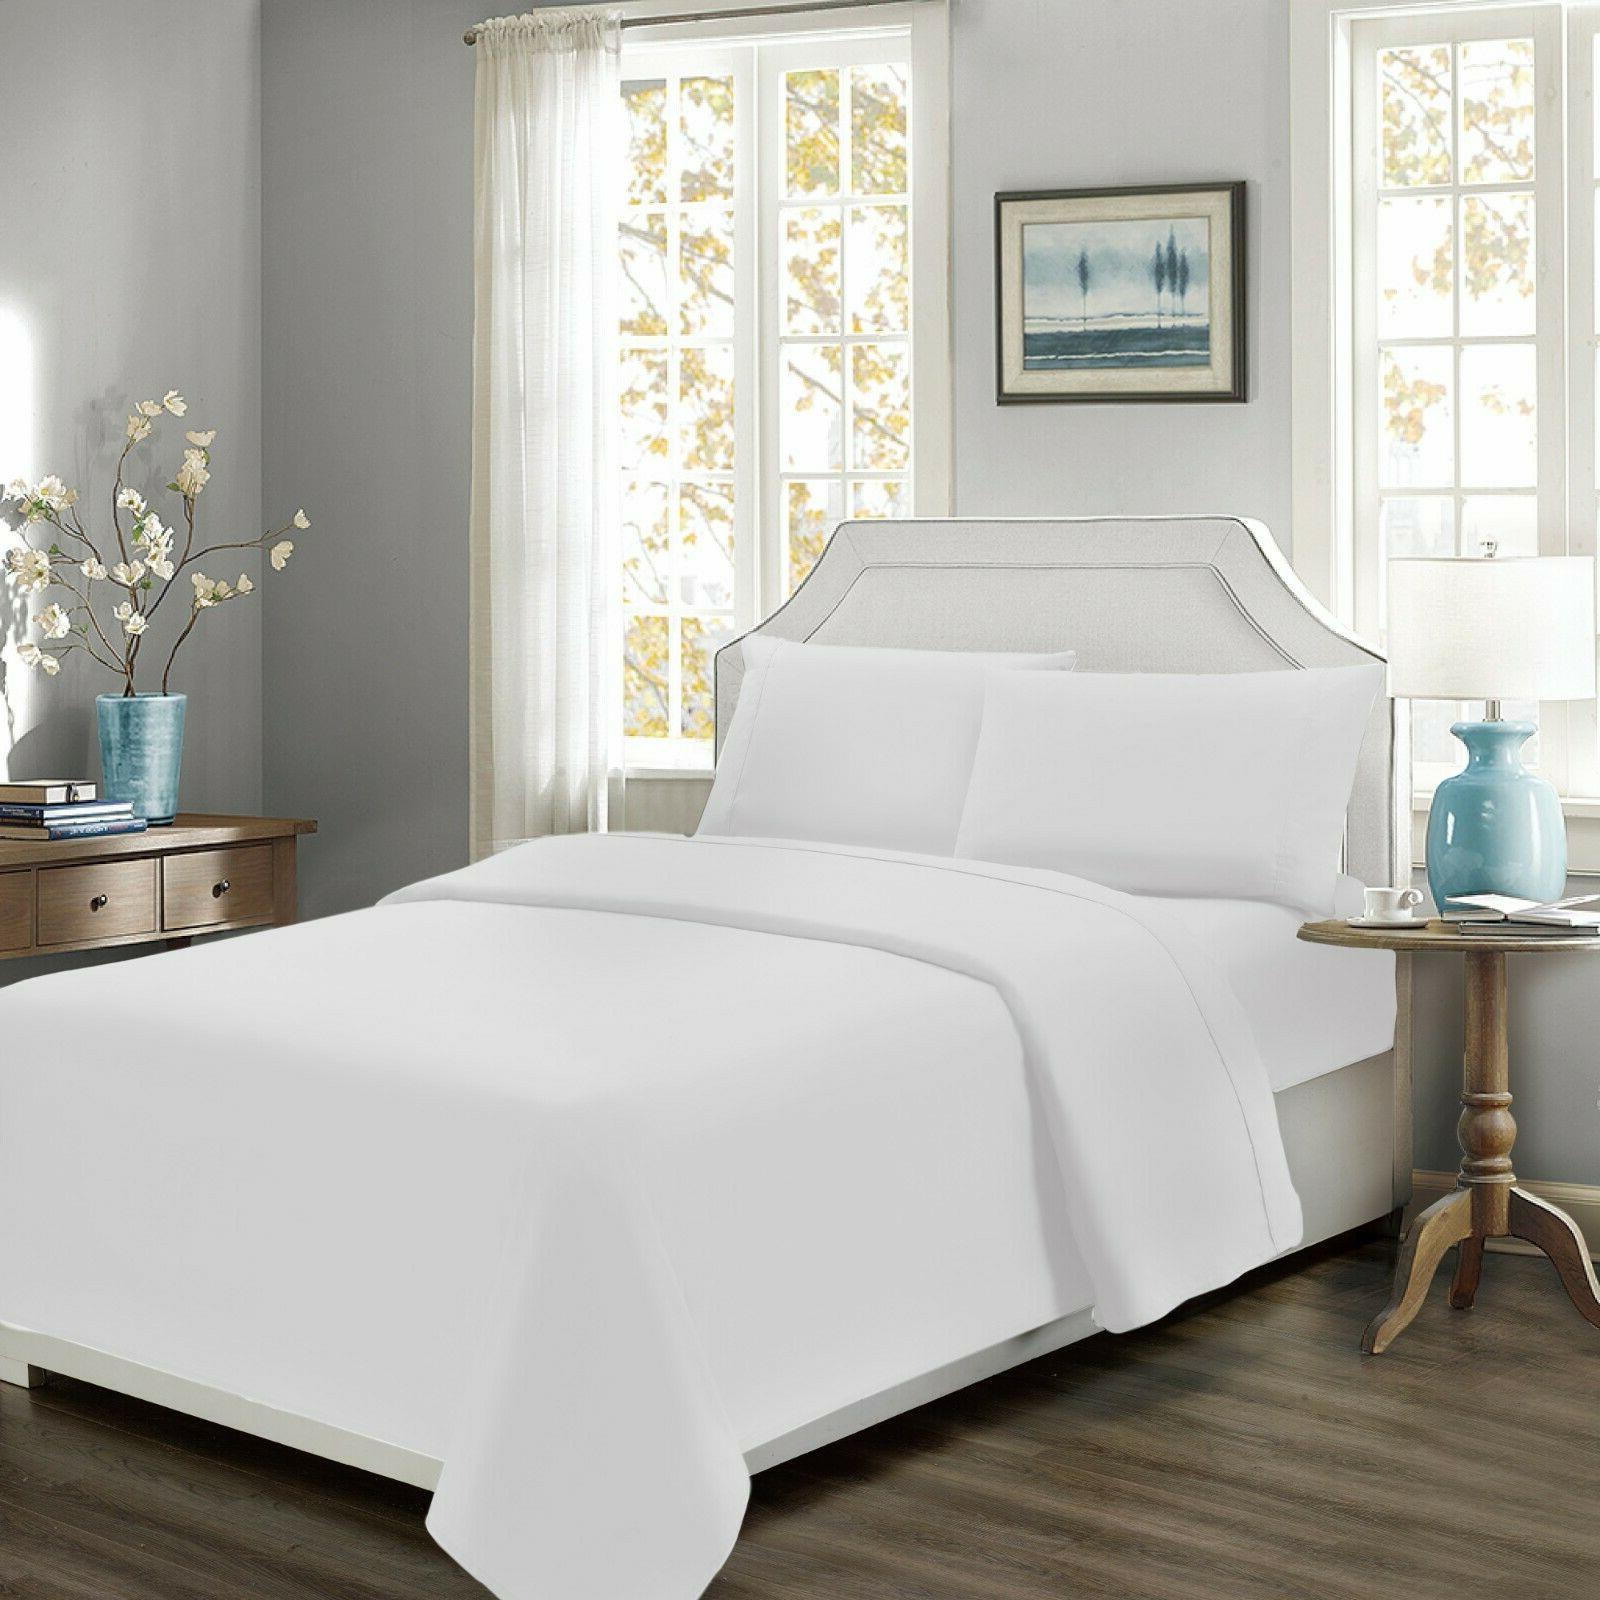 percale cotton bed sheet set 300 threadcount